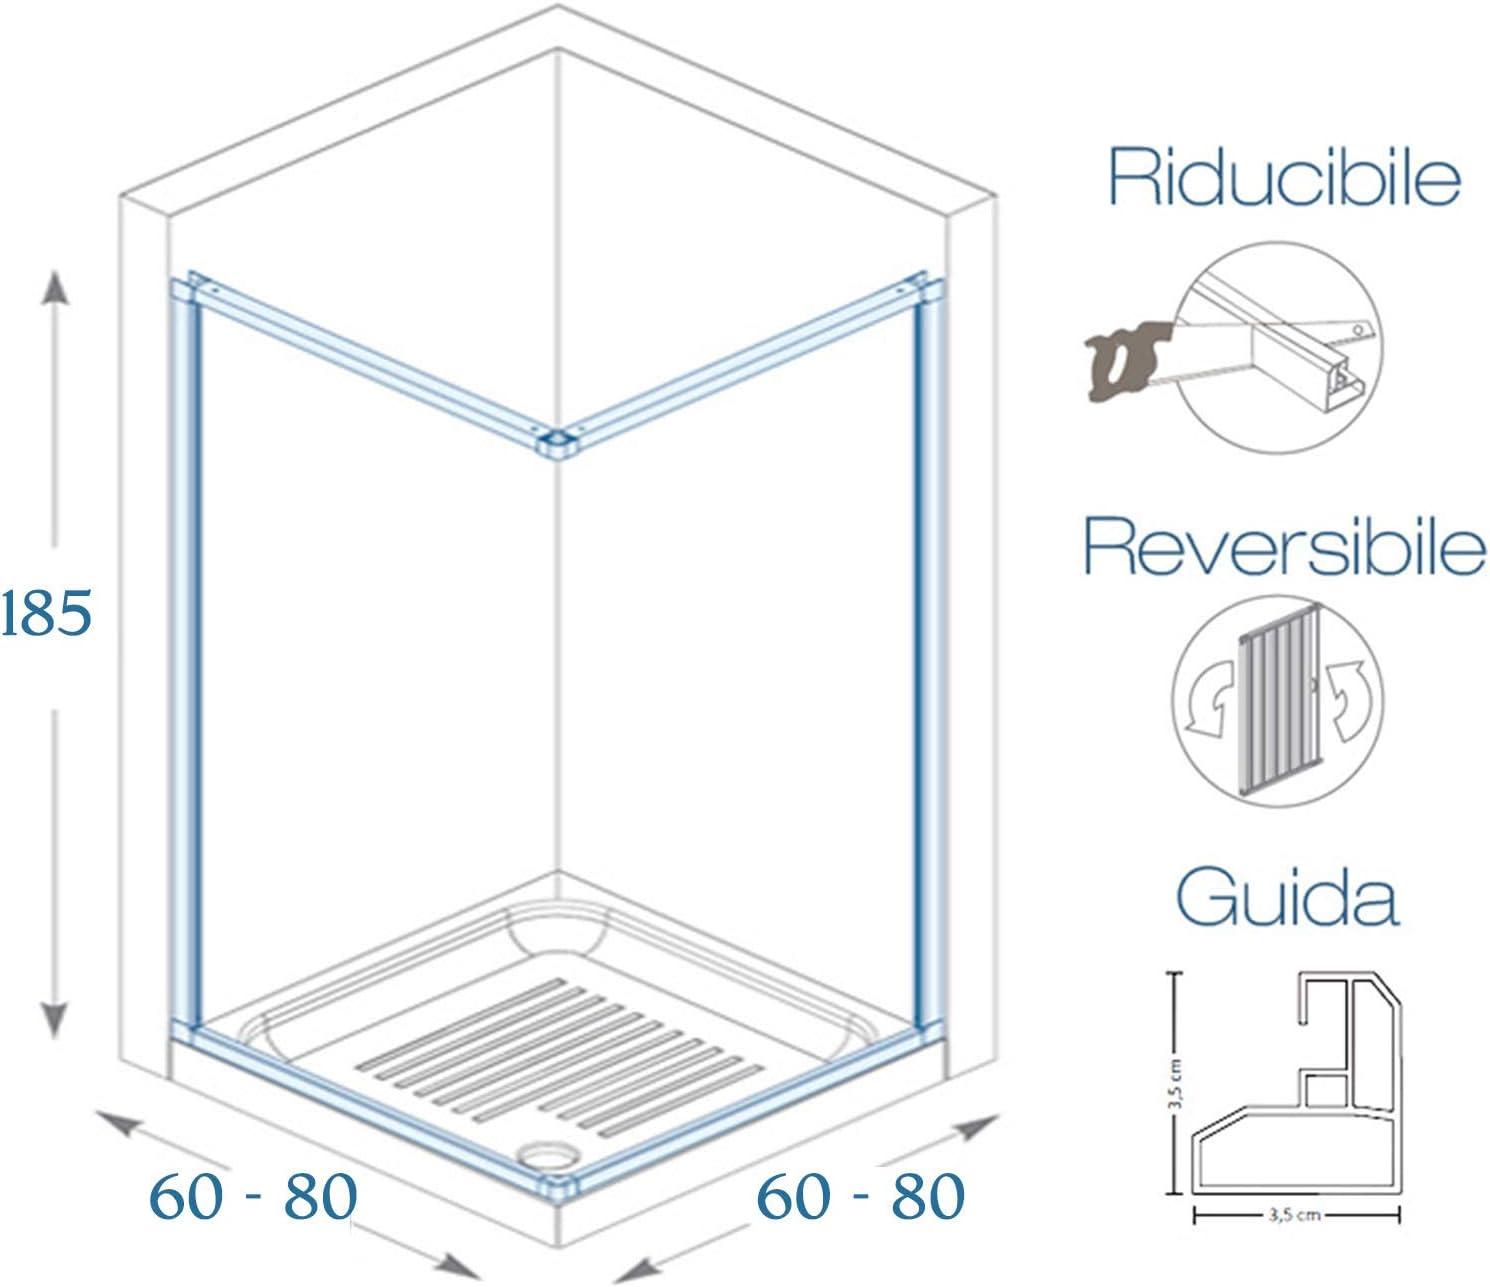 BOX DOCCIA 2 Ante Scorrevoli Mod SKY Apertura Angolare 80-60X80-60 cm H185 cm